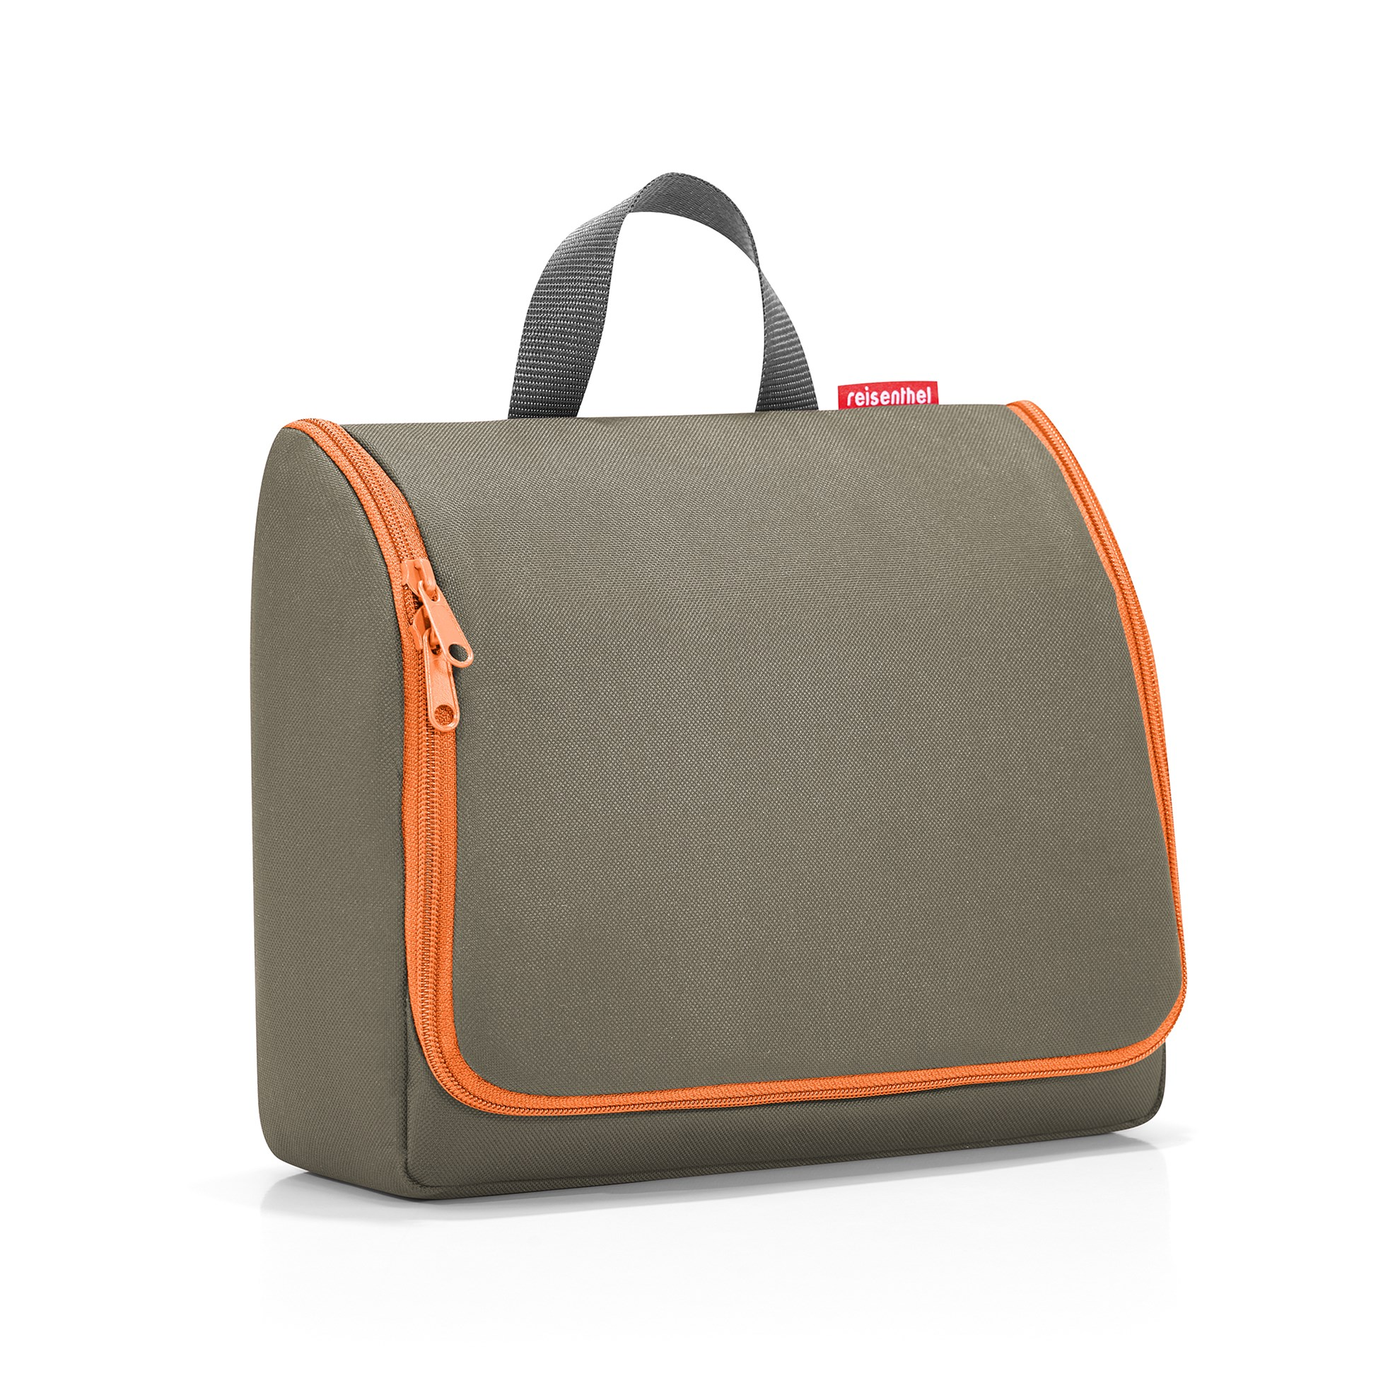 Kosmetická taška Toiletbag XL olive green_0